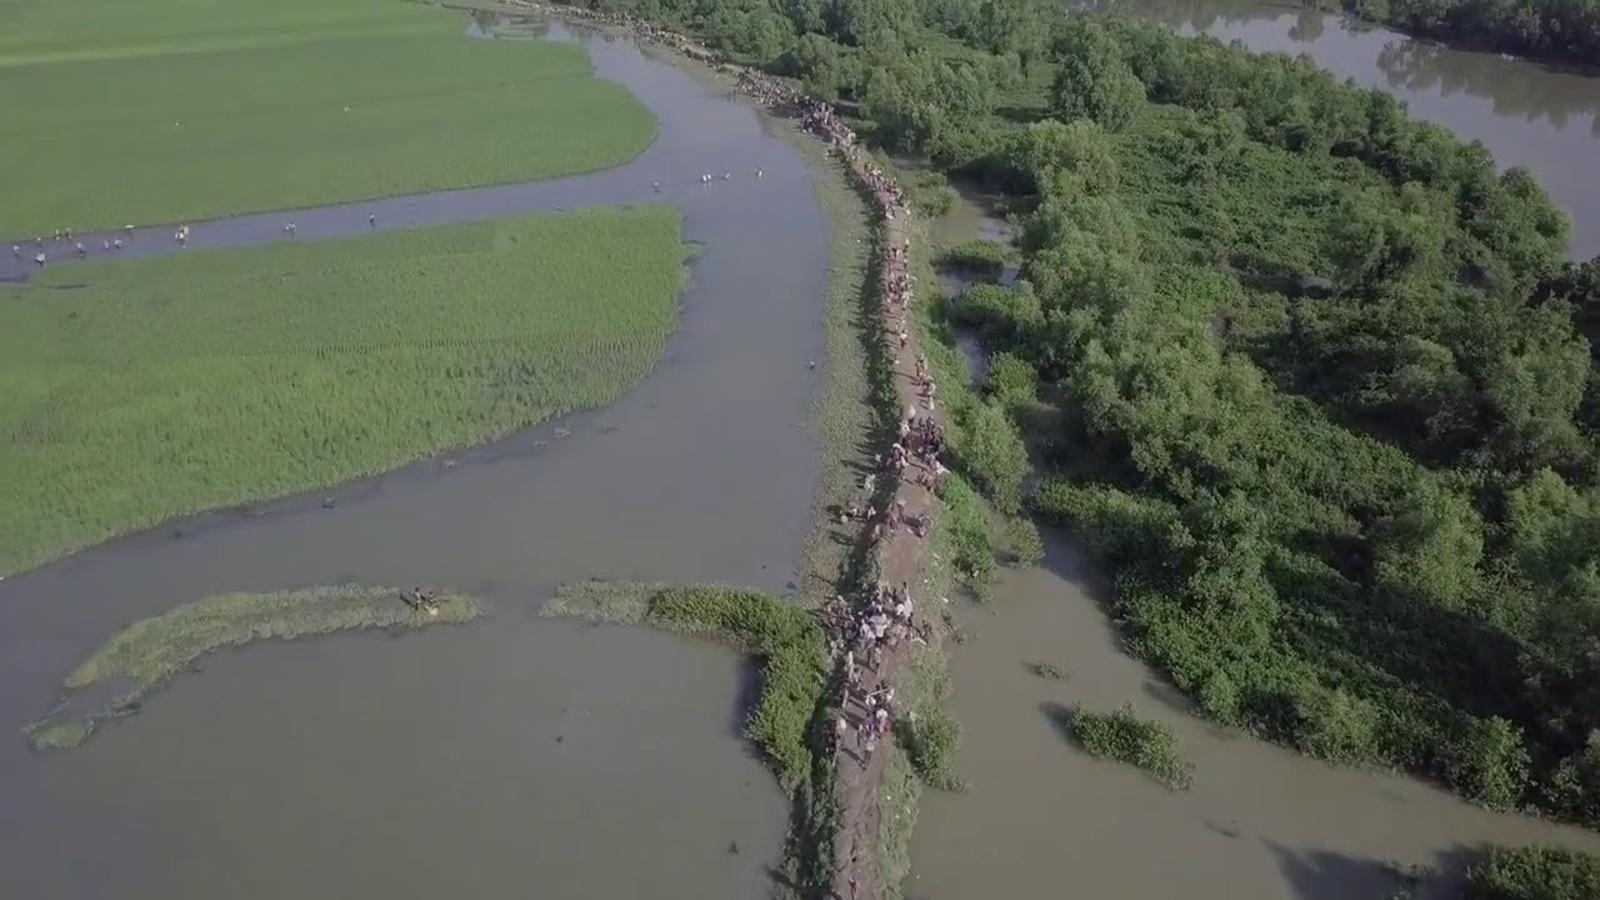 Vista des d'un dron de l'èxode rohingya.